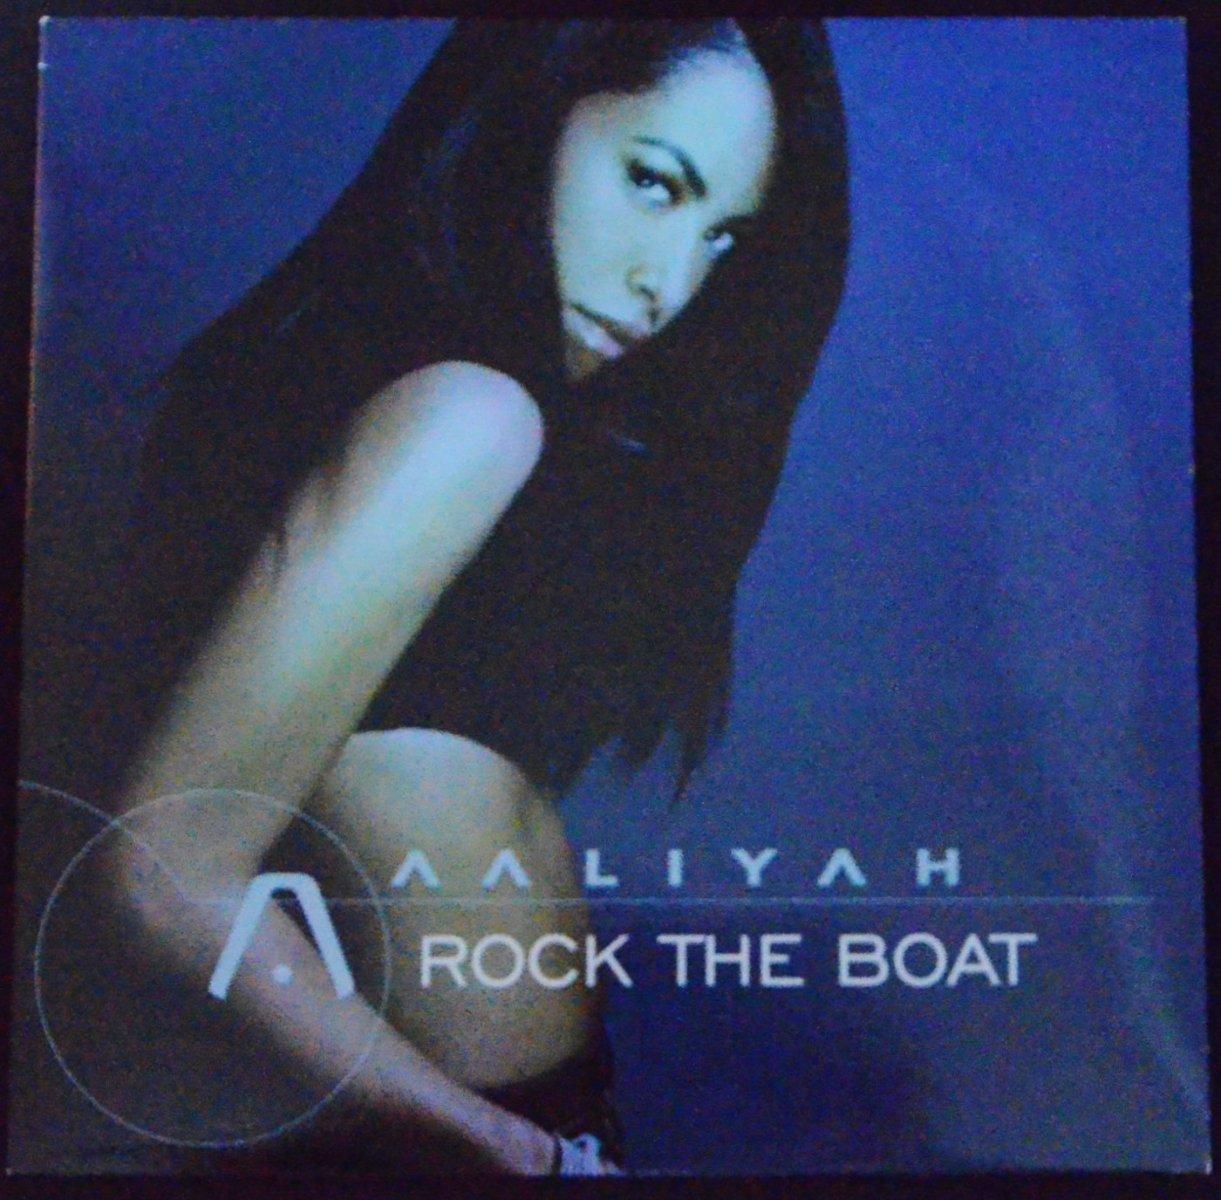 AALIYAH / ROCK THE BOAT (12